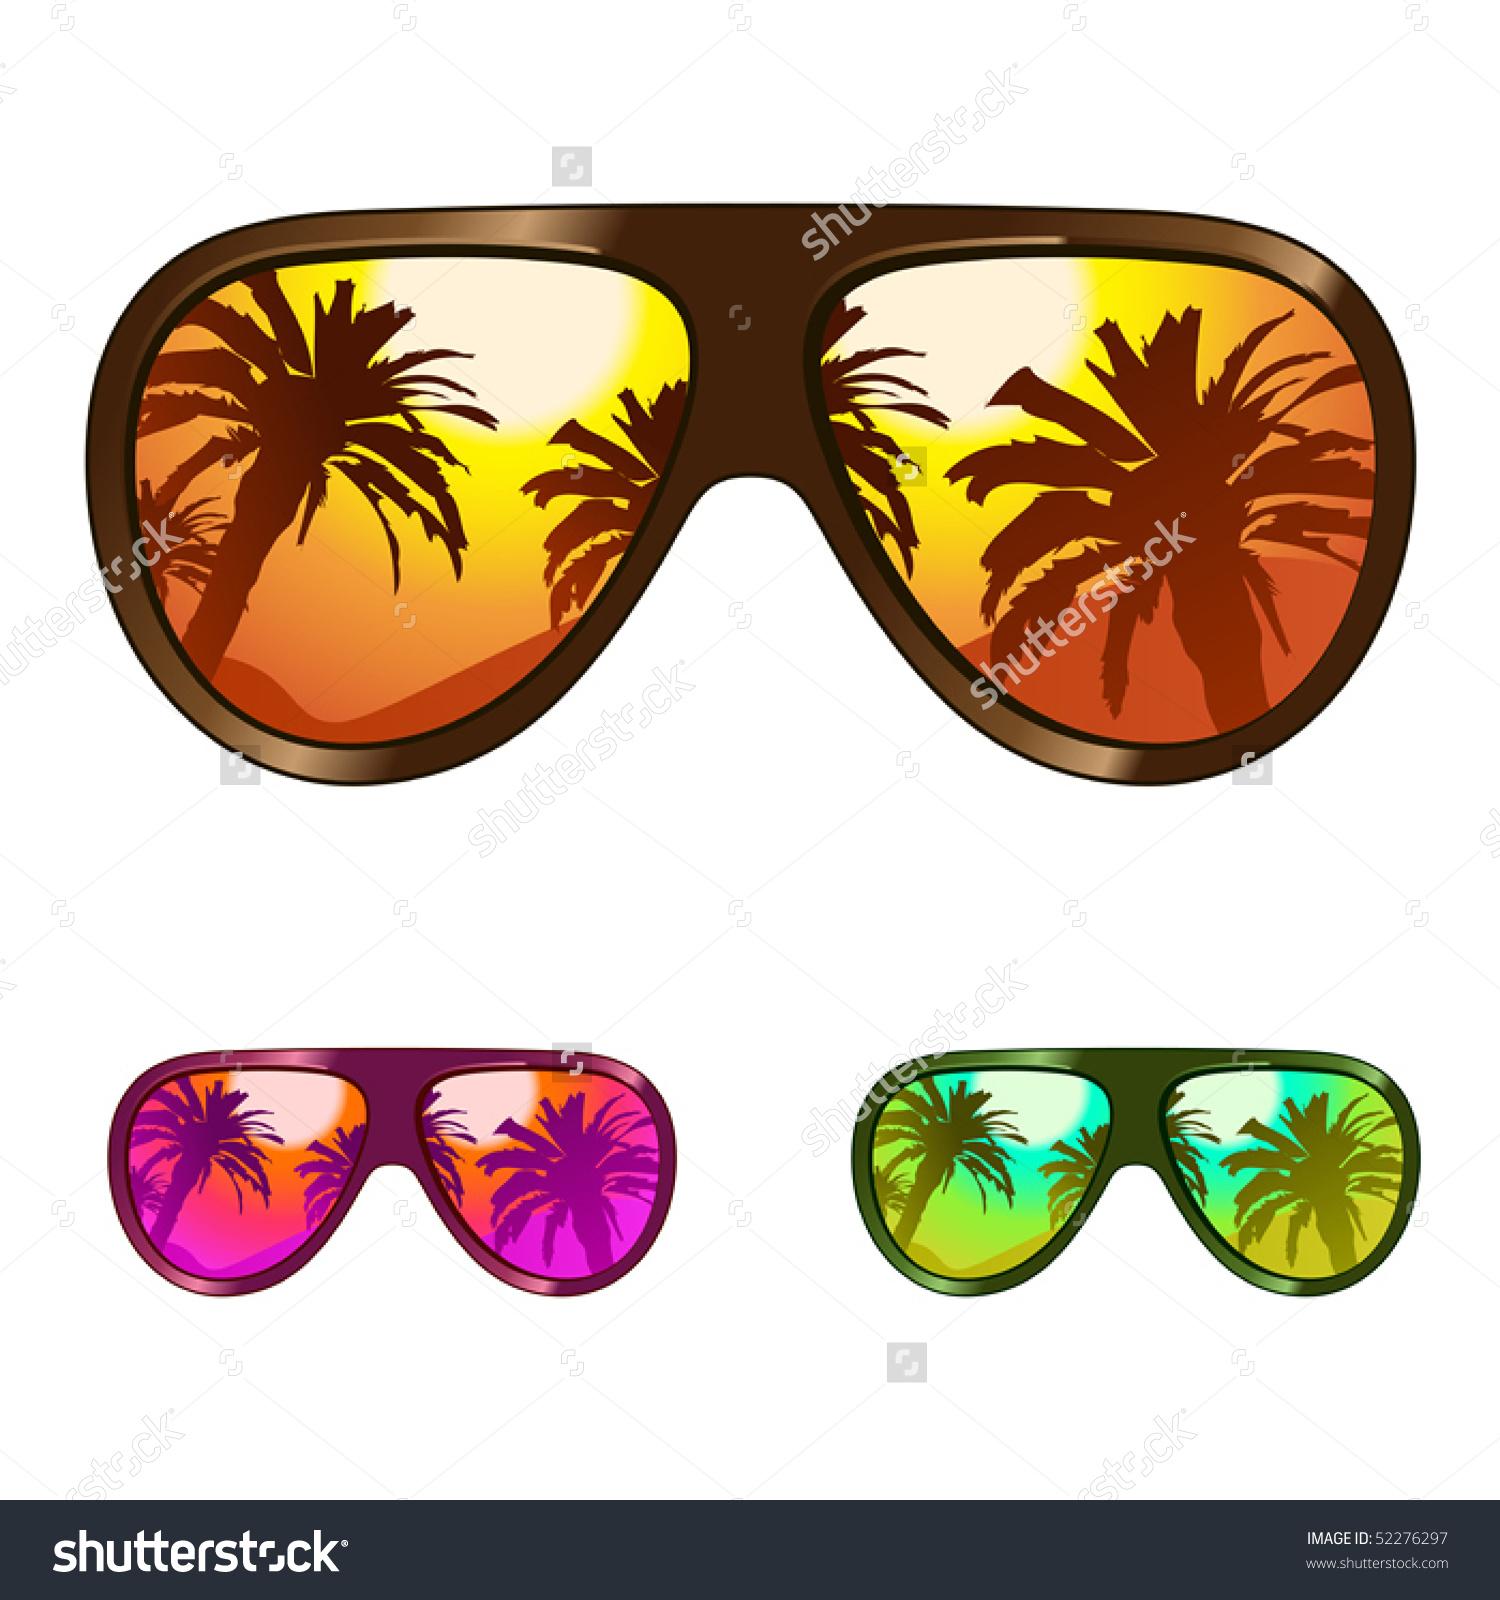 Tropics clipart sunglass #8